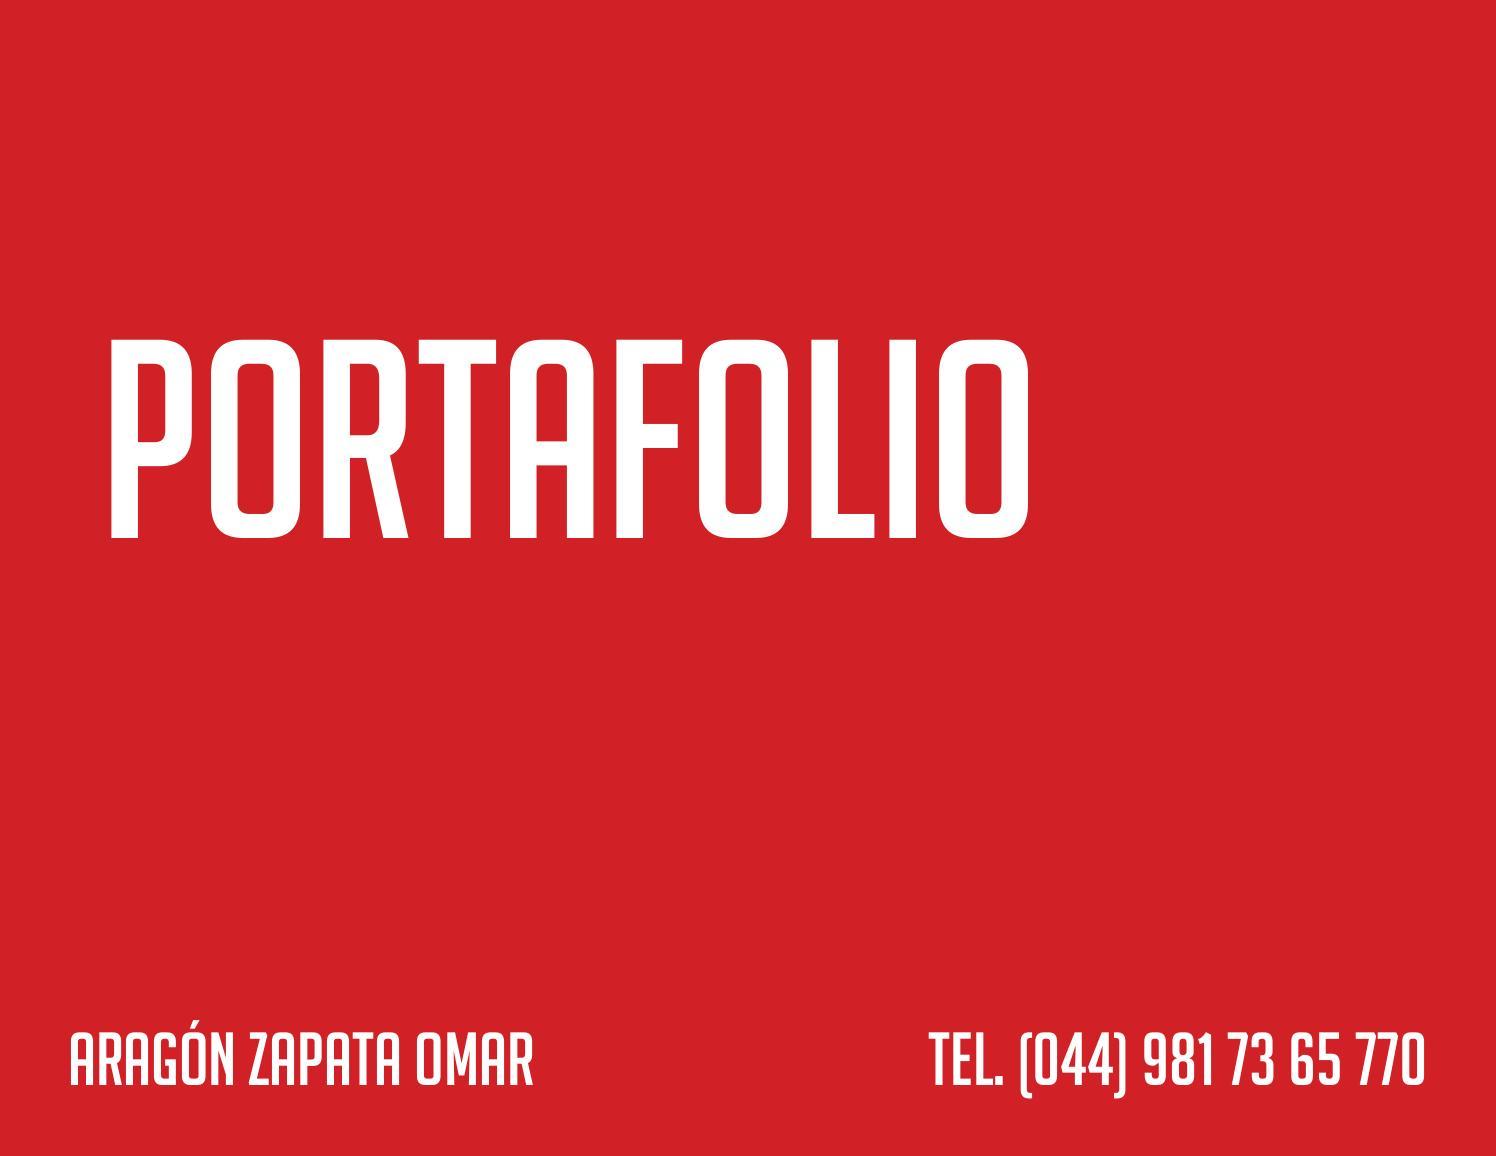 Portafolio digital by bambidx - issuu 51617252401